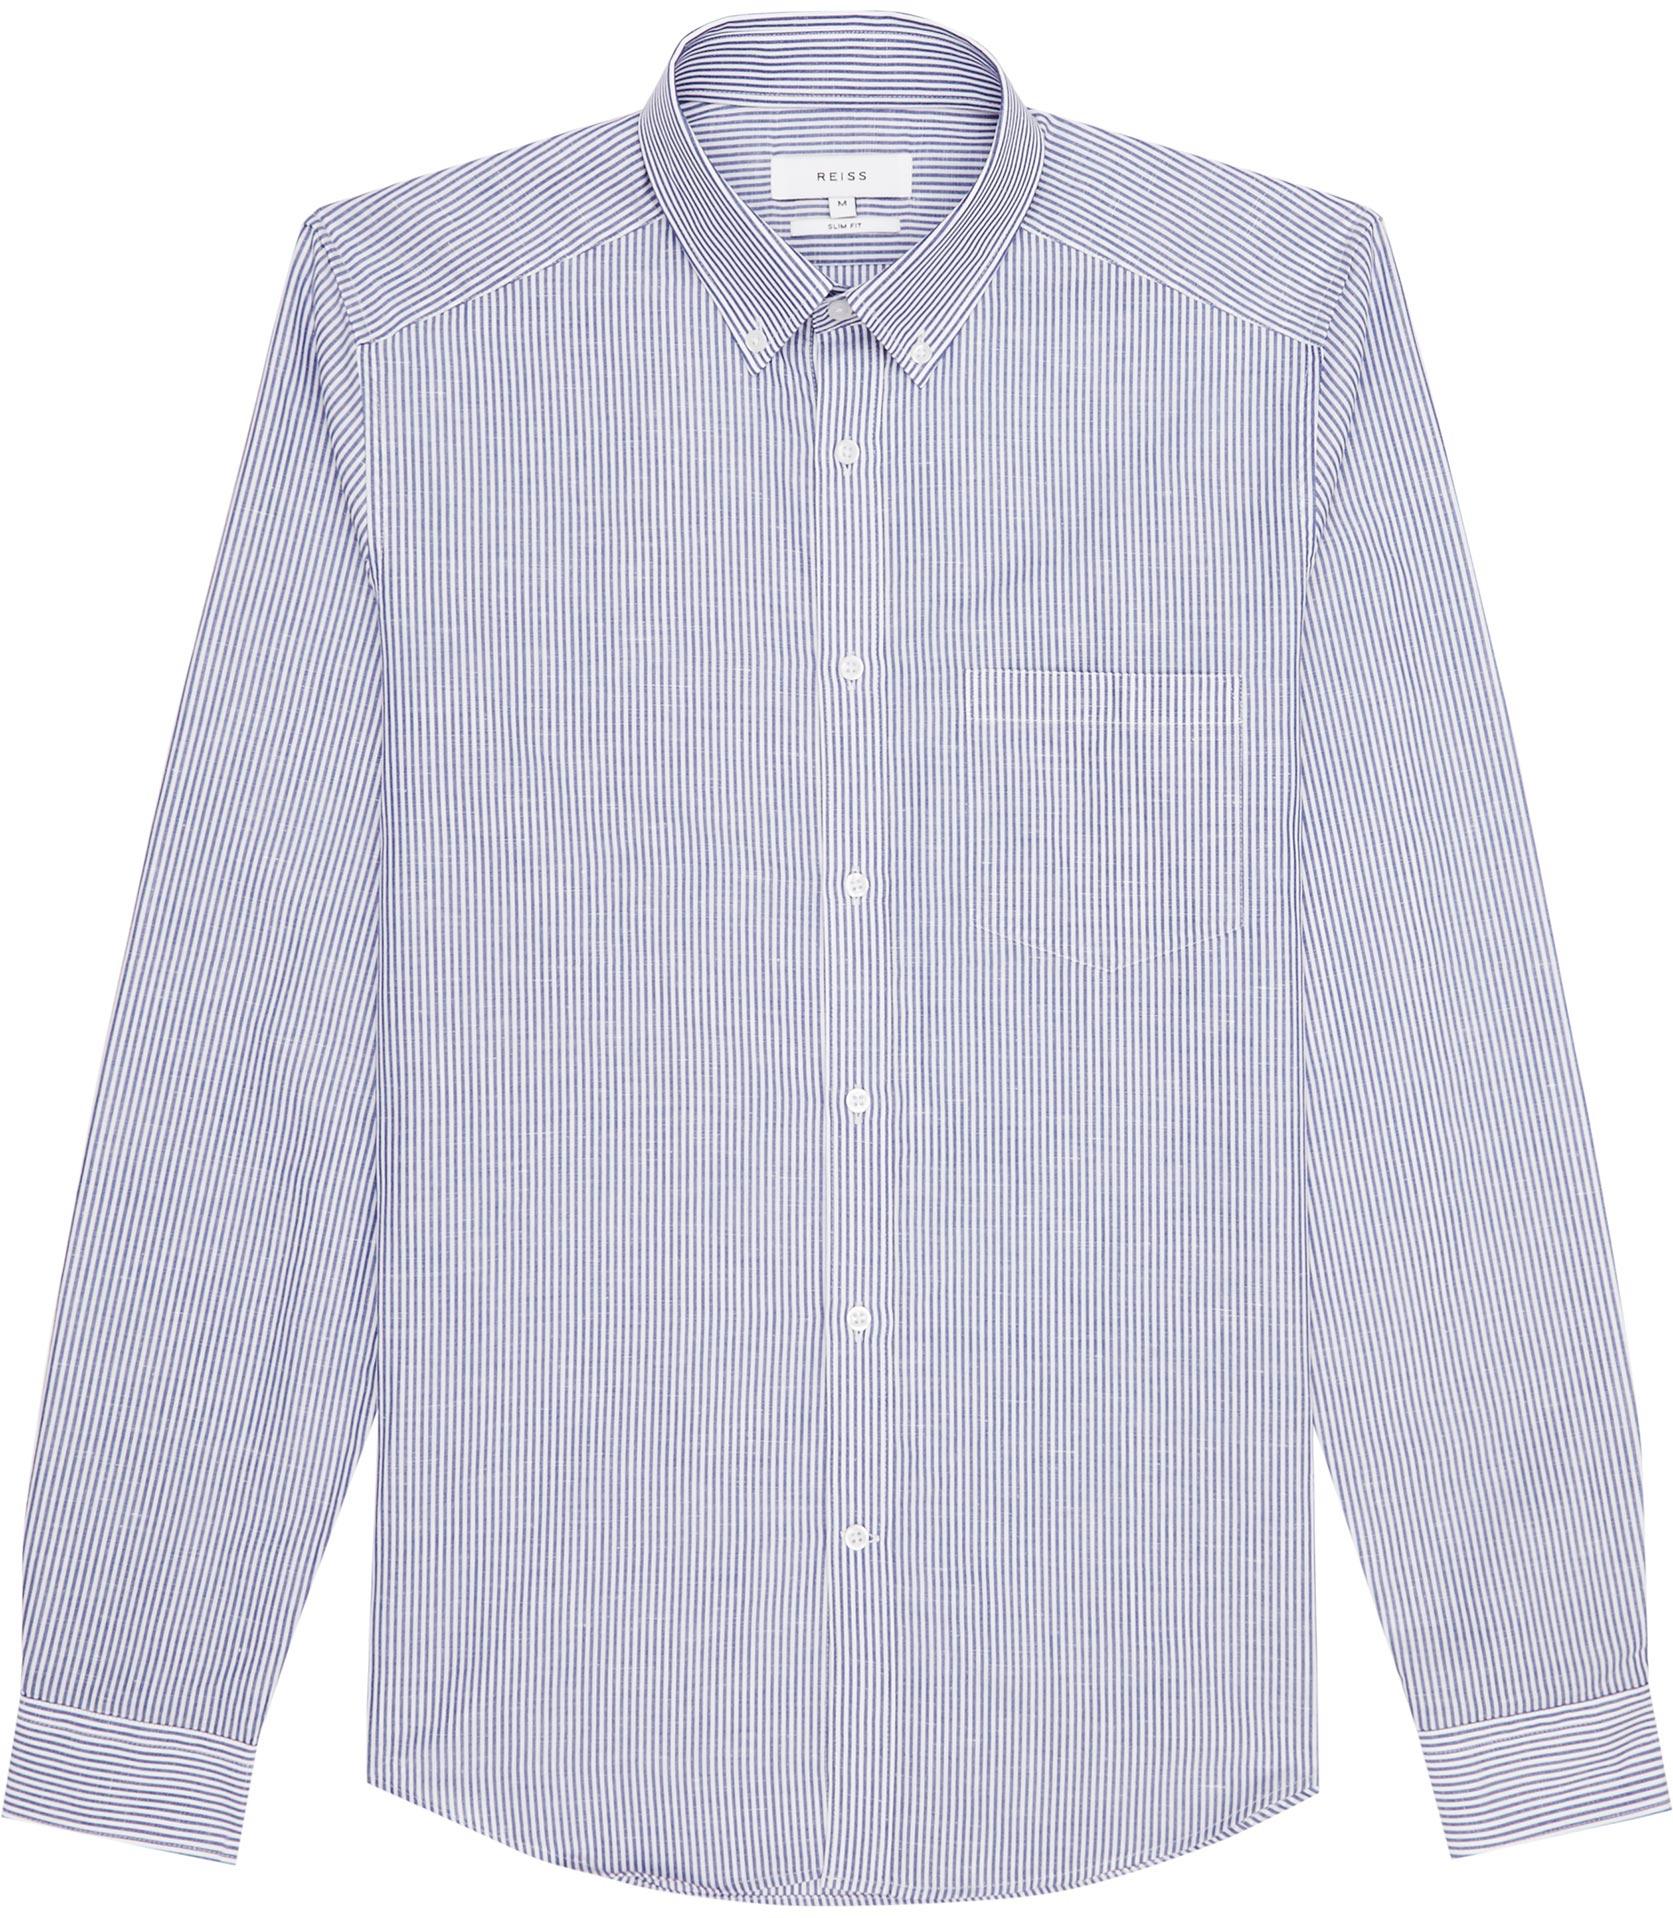 Reiss garcia stripe button down shirt in blue for men lyst for Striped button down shirts for men